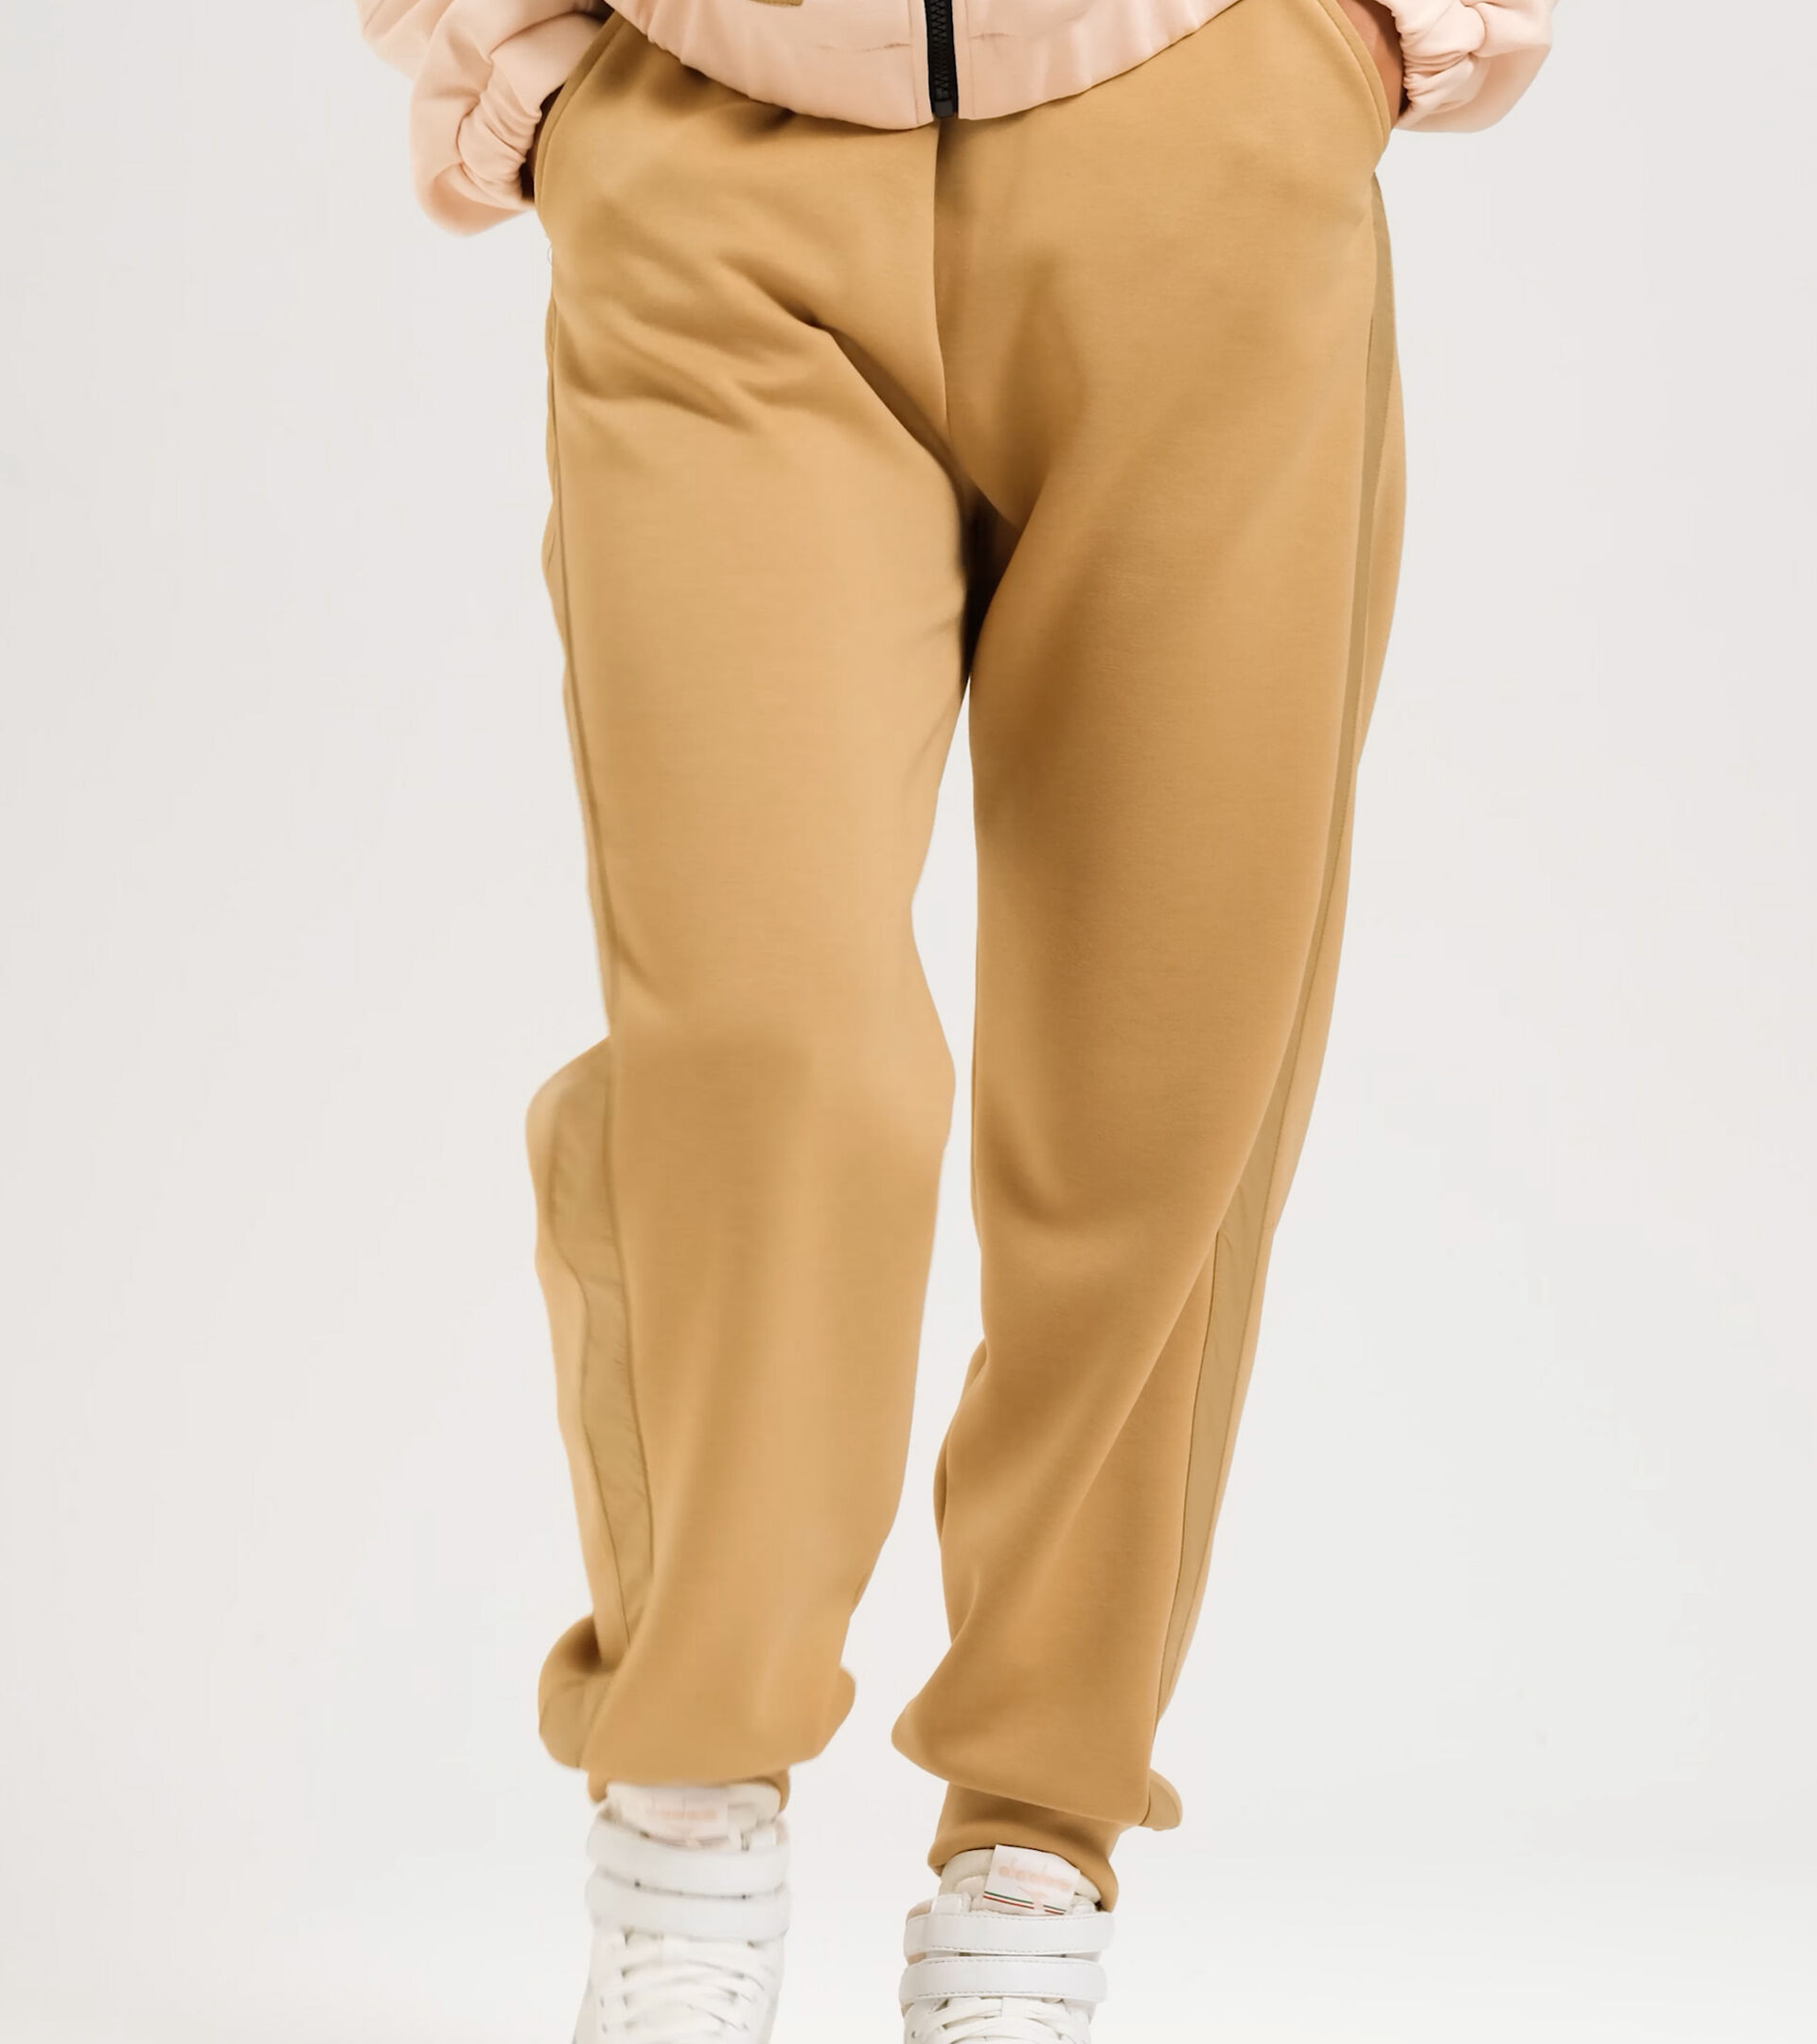 Pantalones deportivos - Mujer  L. PANT URBANITY ESTRELLA DE MAR - Diadora